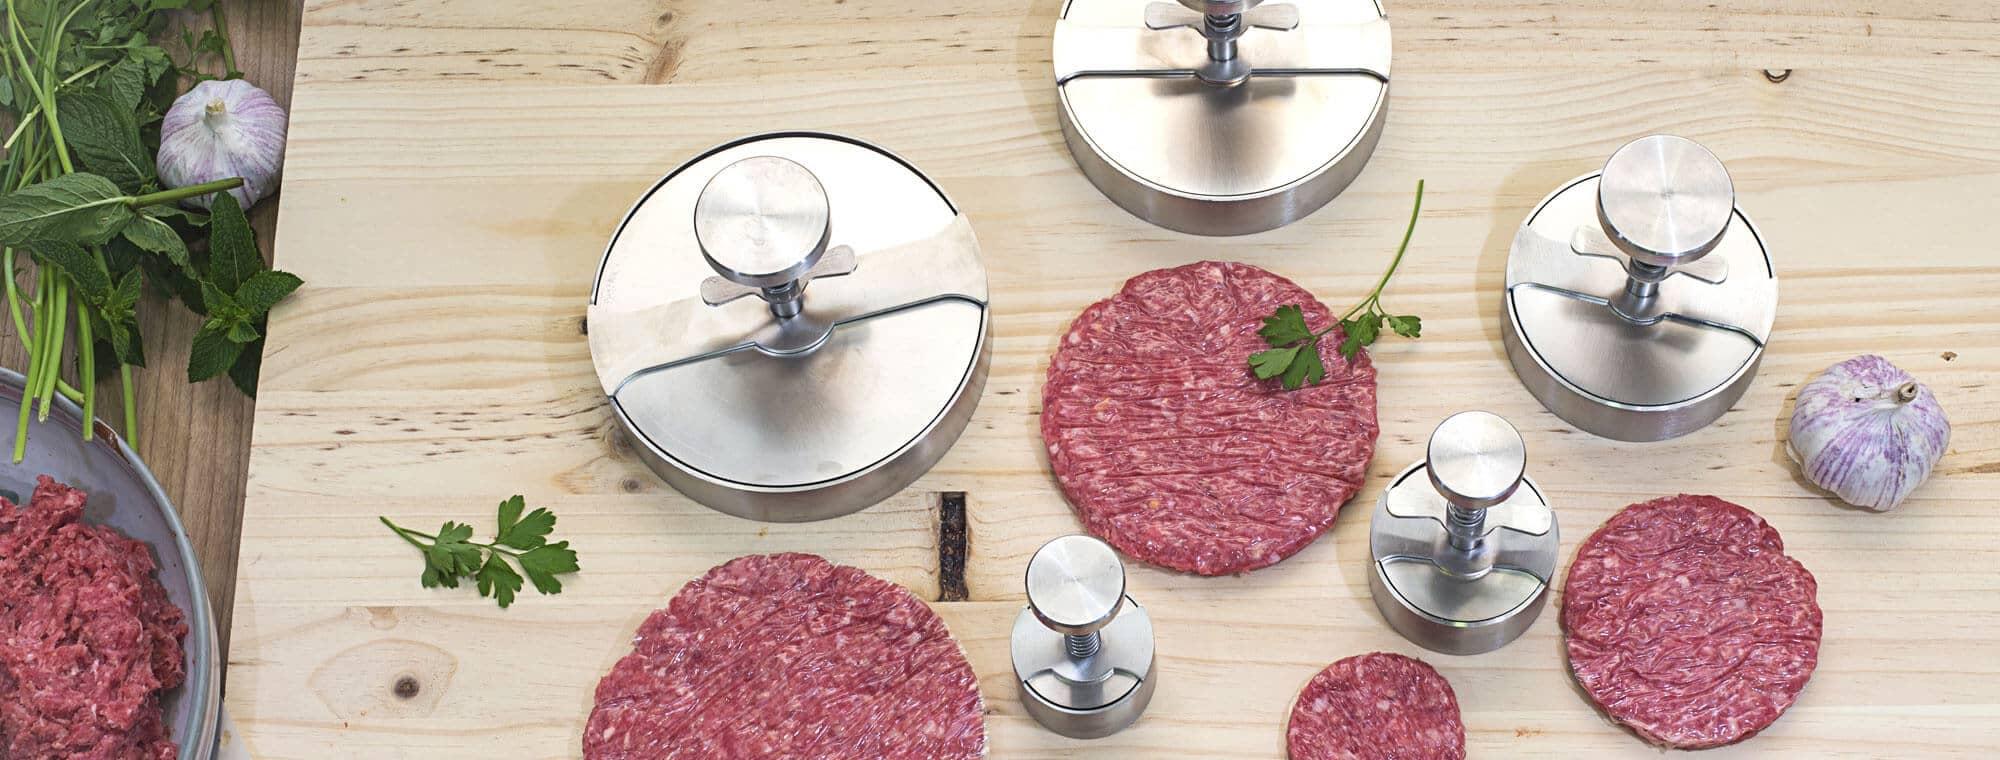 formadora hamburguesa